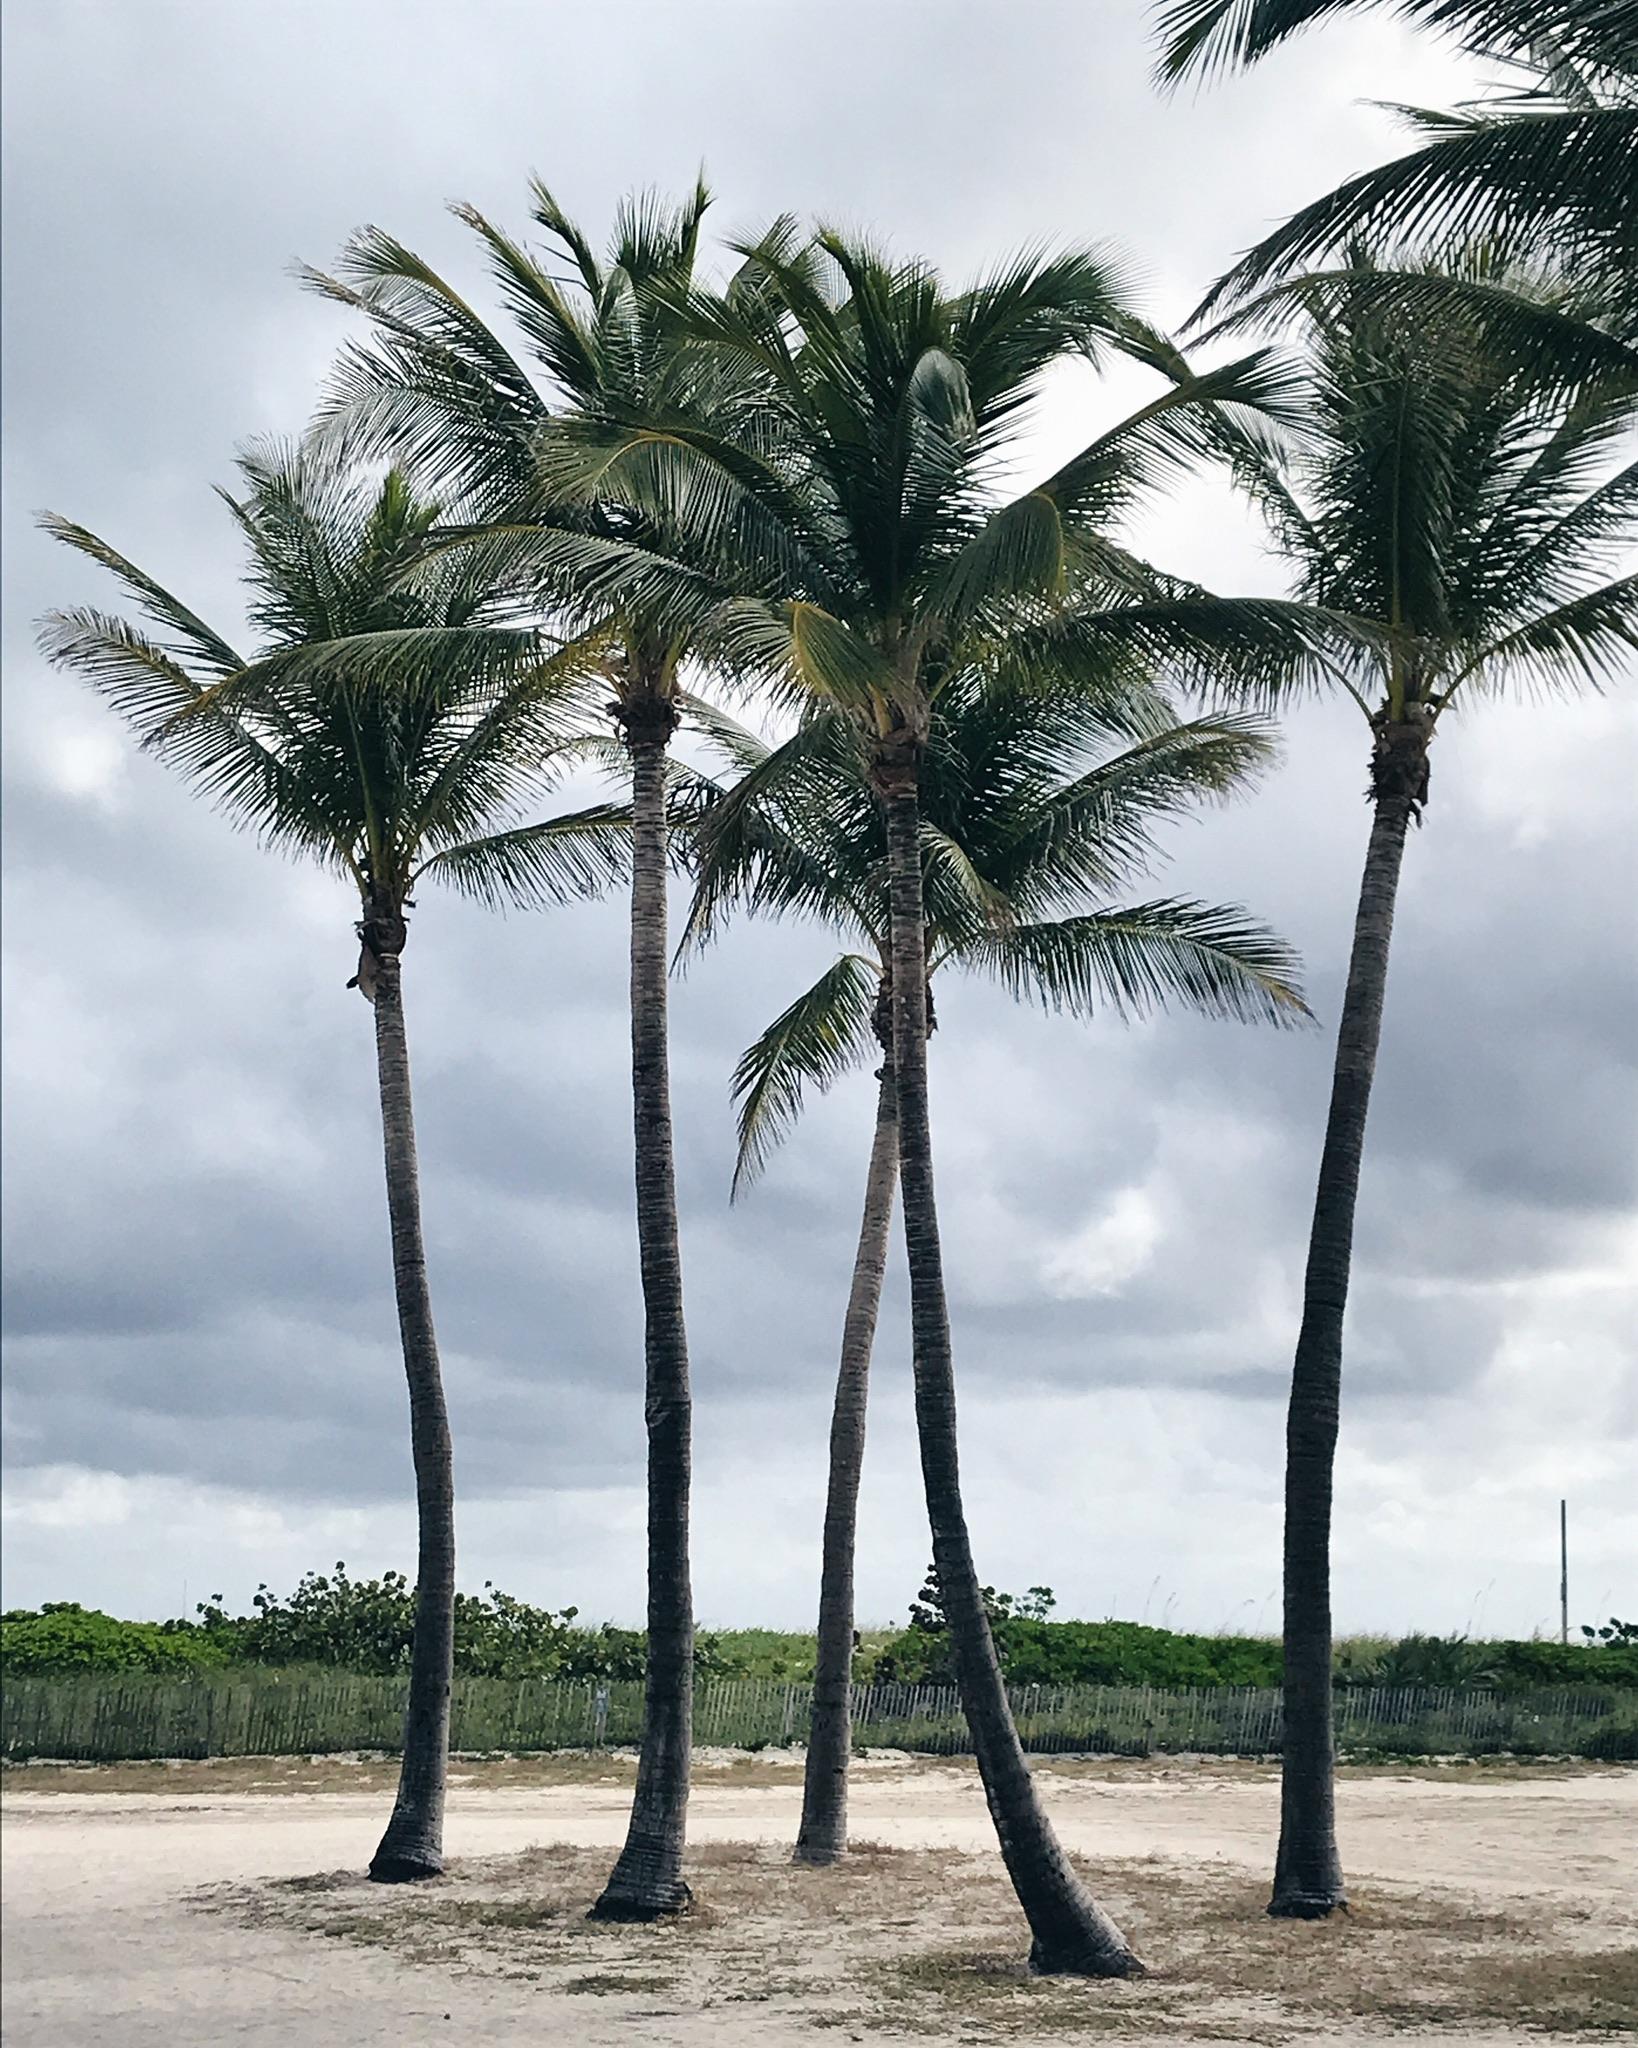 miami beach, life with aco, palm trees